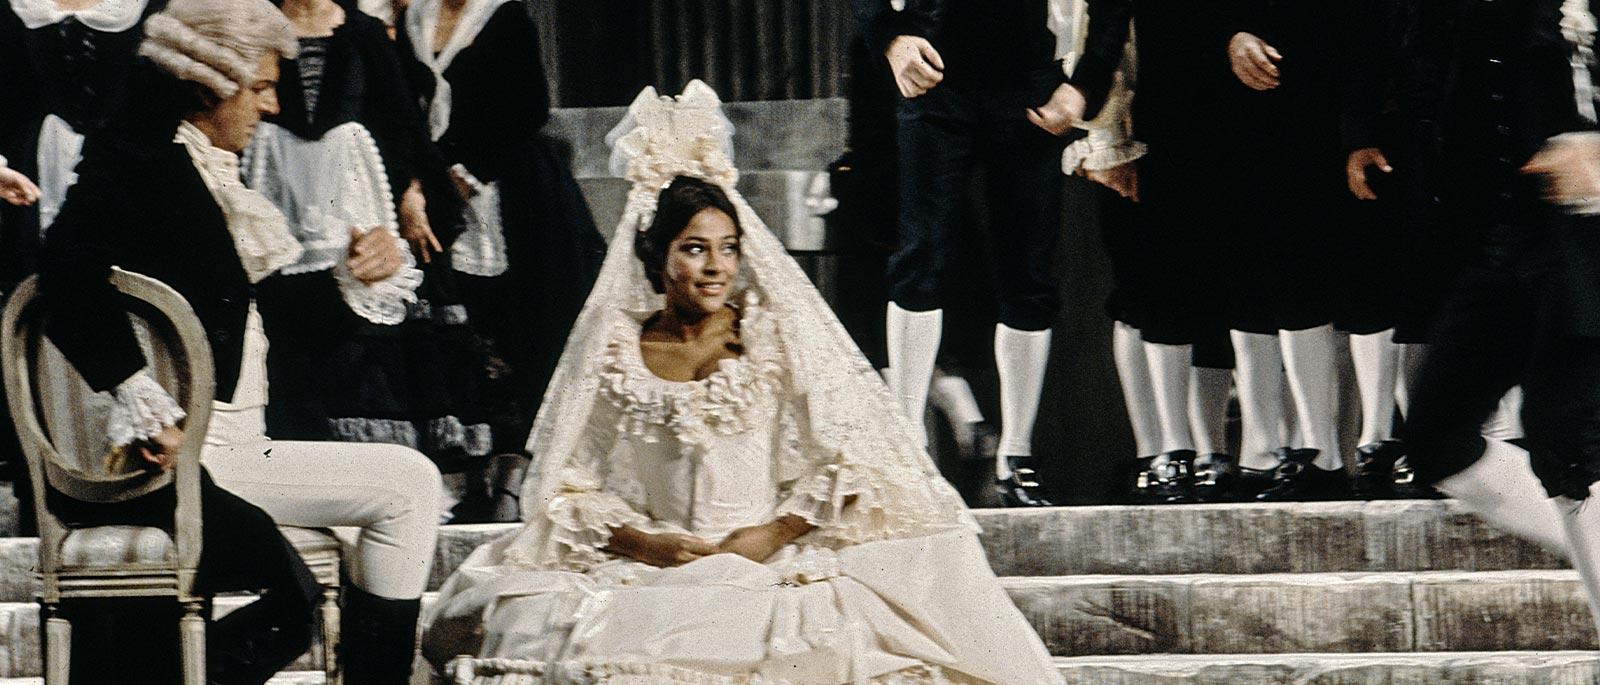 Battle, Kathleen as Susanna in Le Nozze di Figaro 1600x685.jpg